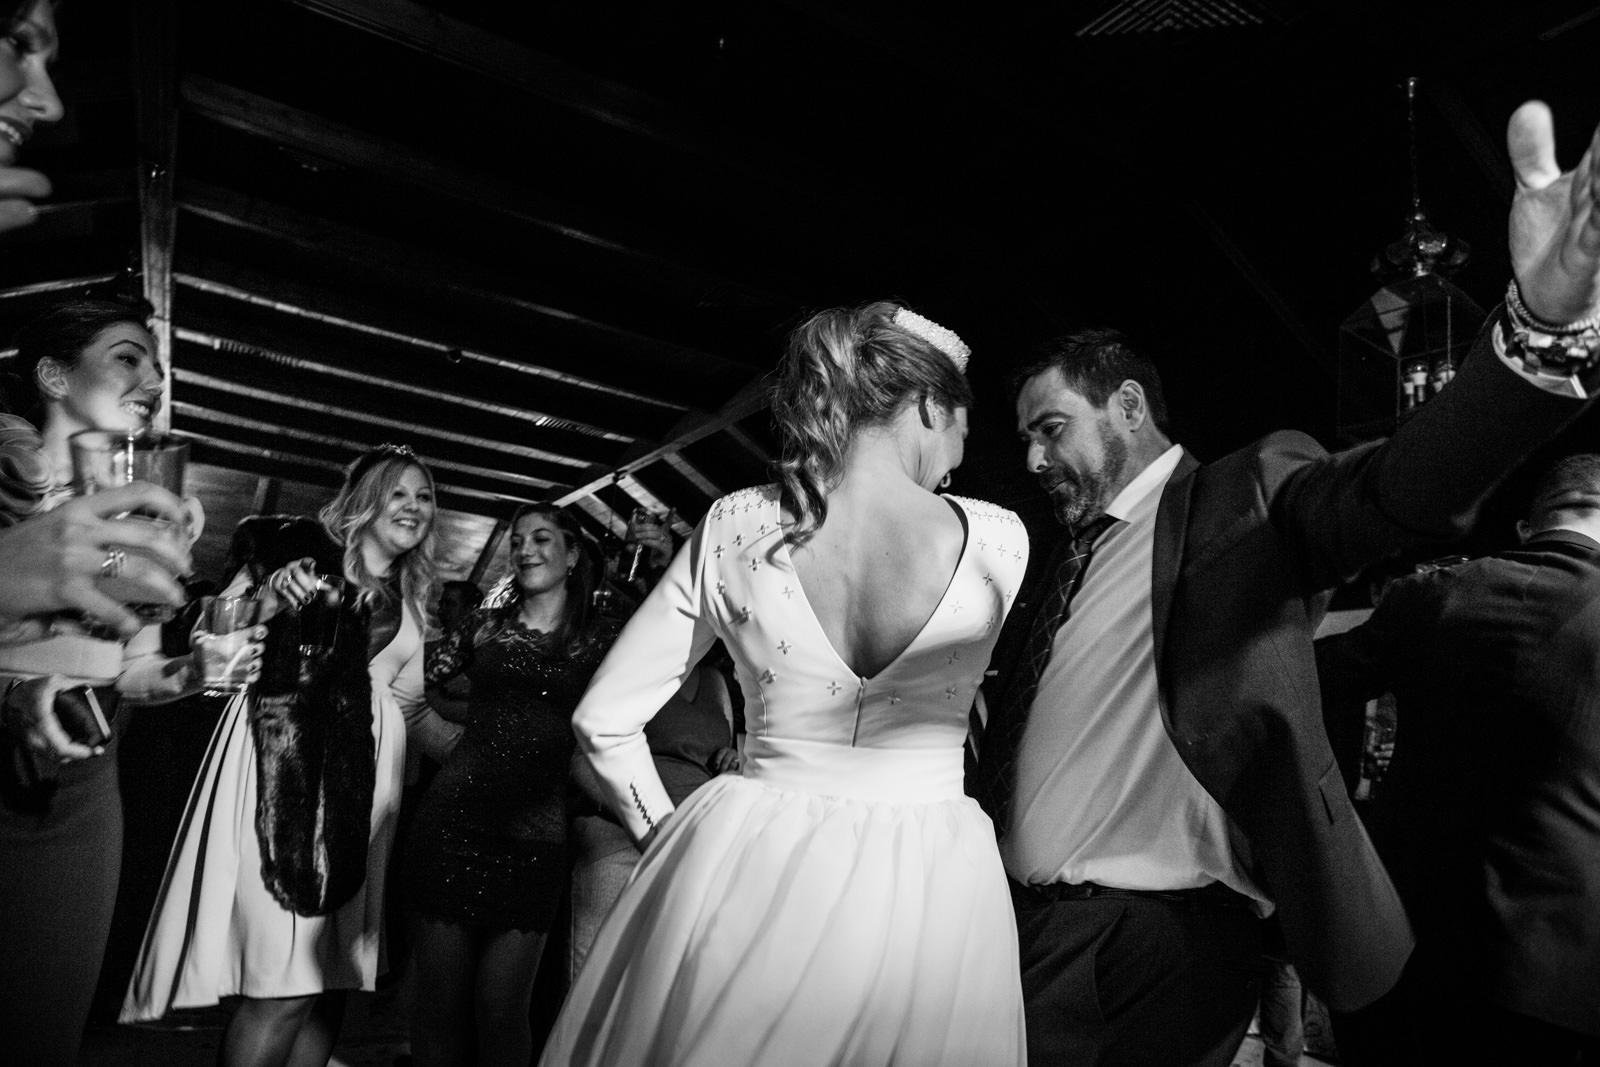 Boda-Sevilla-Parador-Carmona-bridal-engagement-Rafael-Torres-fotografo-bodas-sevilla-madrid-barcelona-wedding-photographer--67.jpg